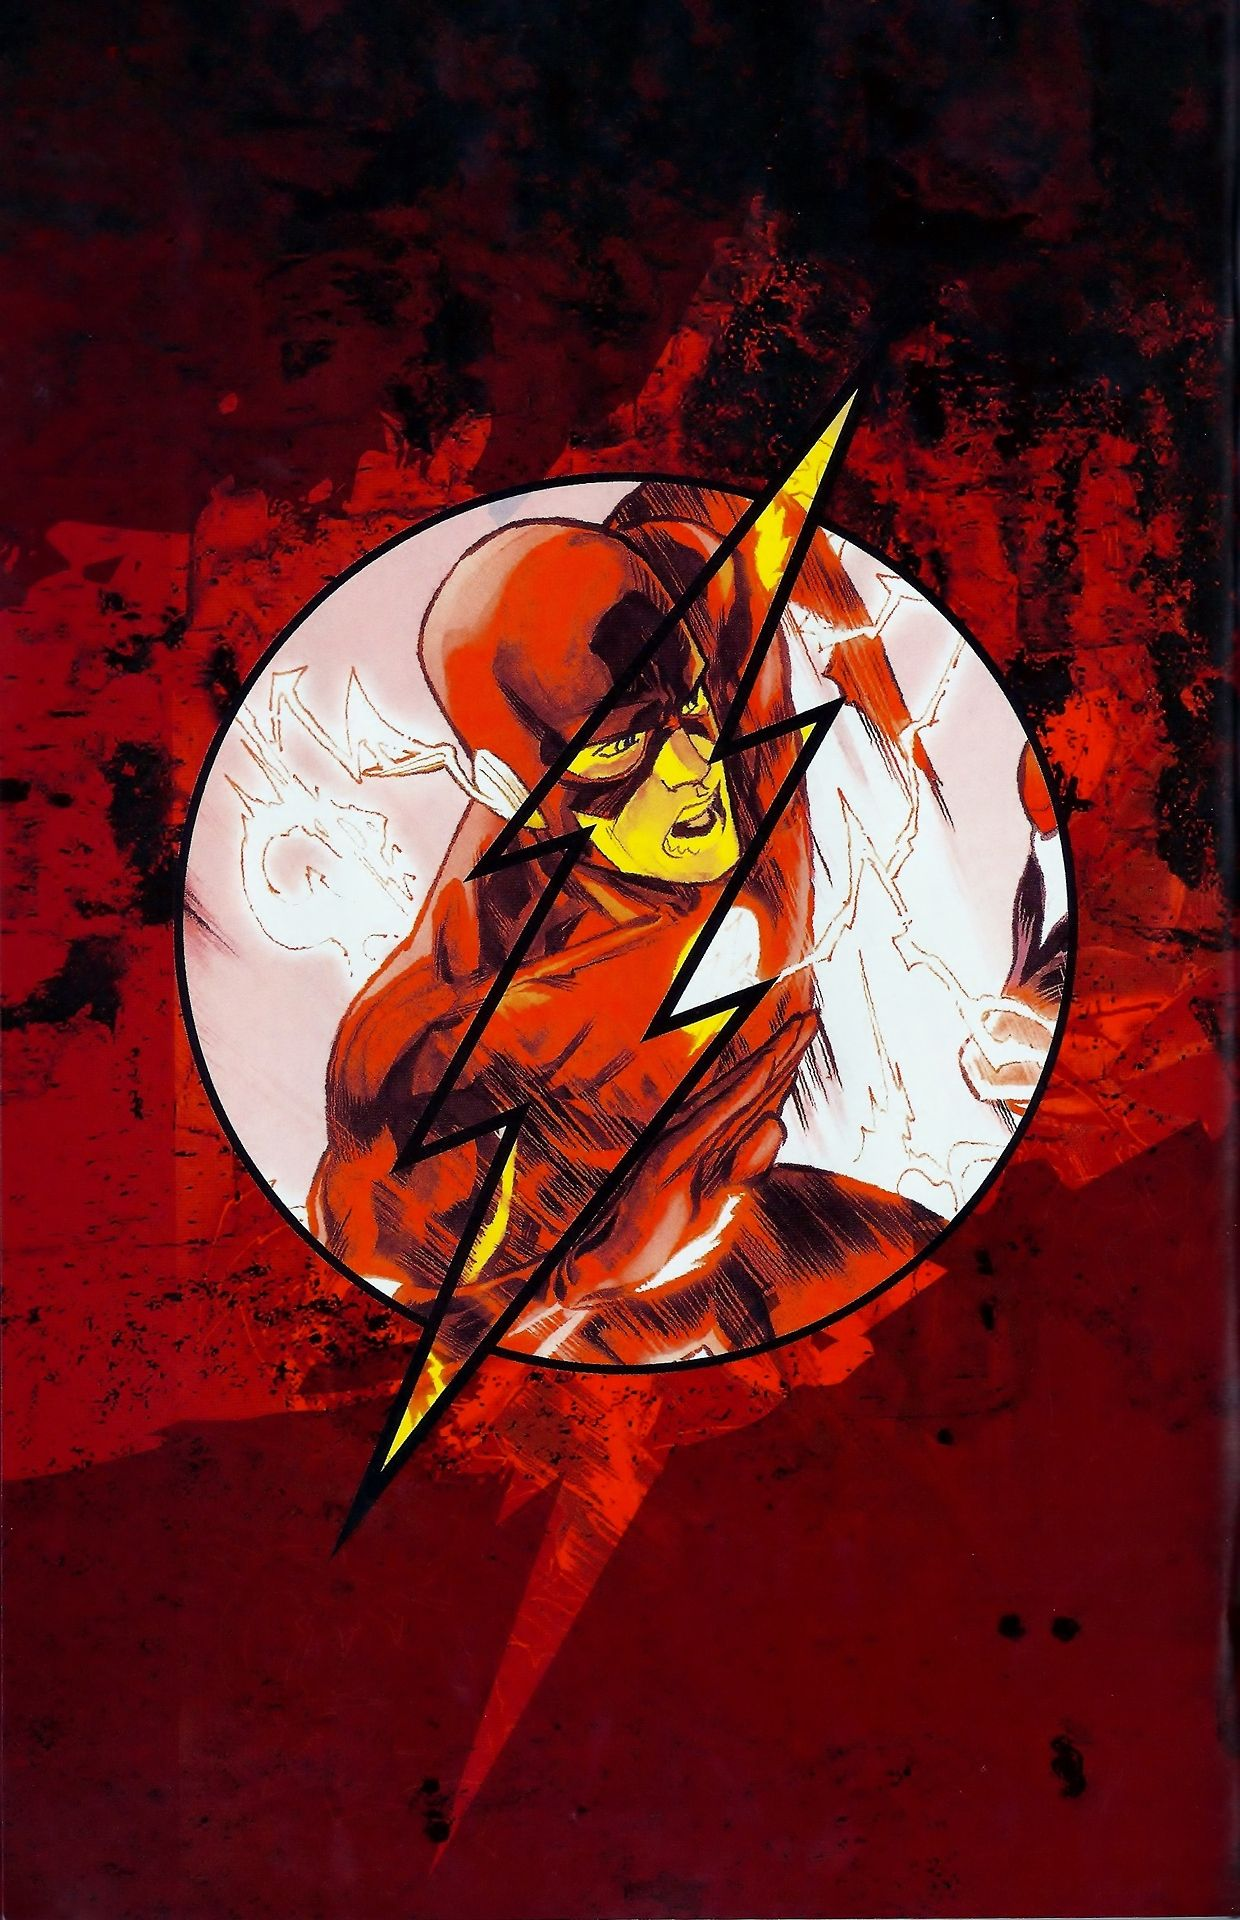 The Flash Flash wallpaper, The flash, Kid flash